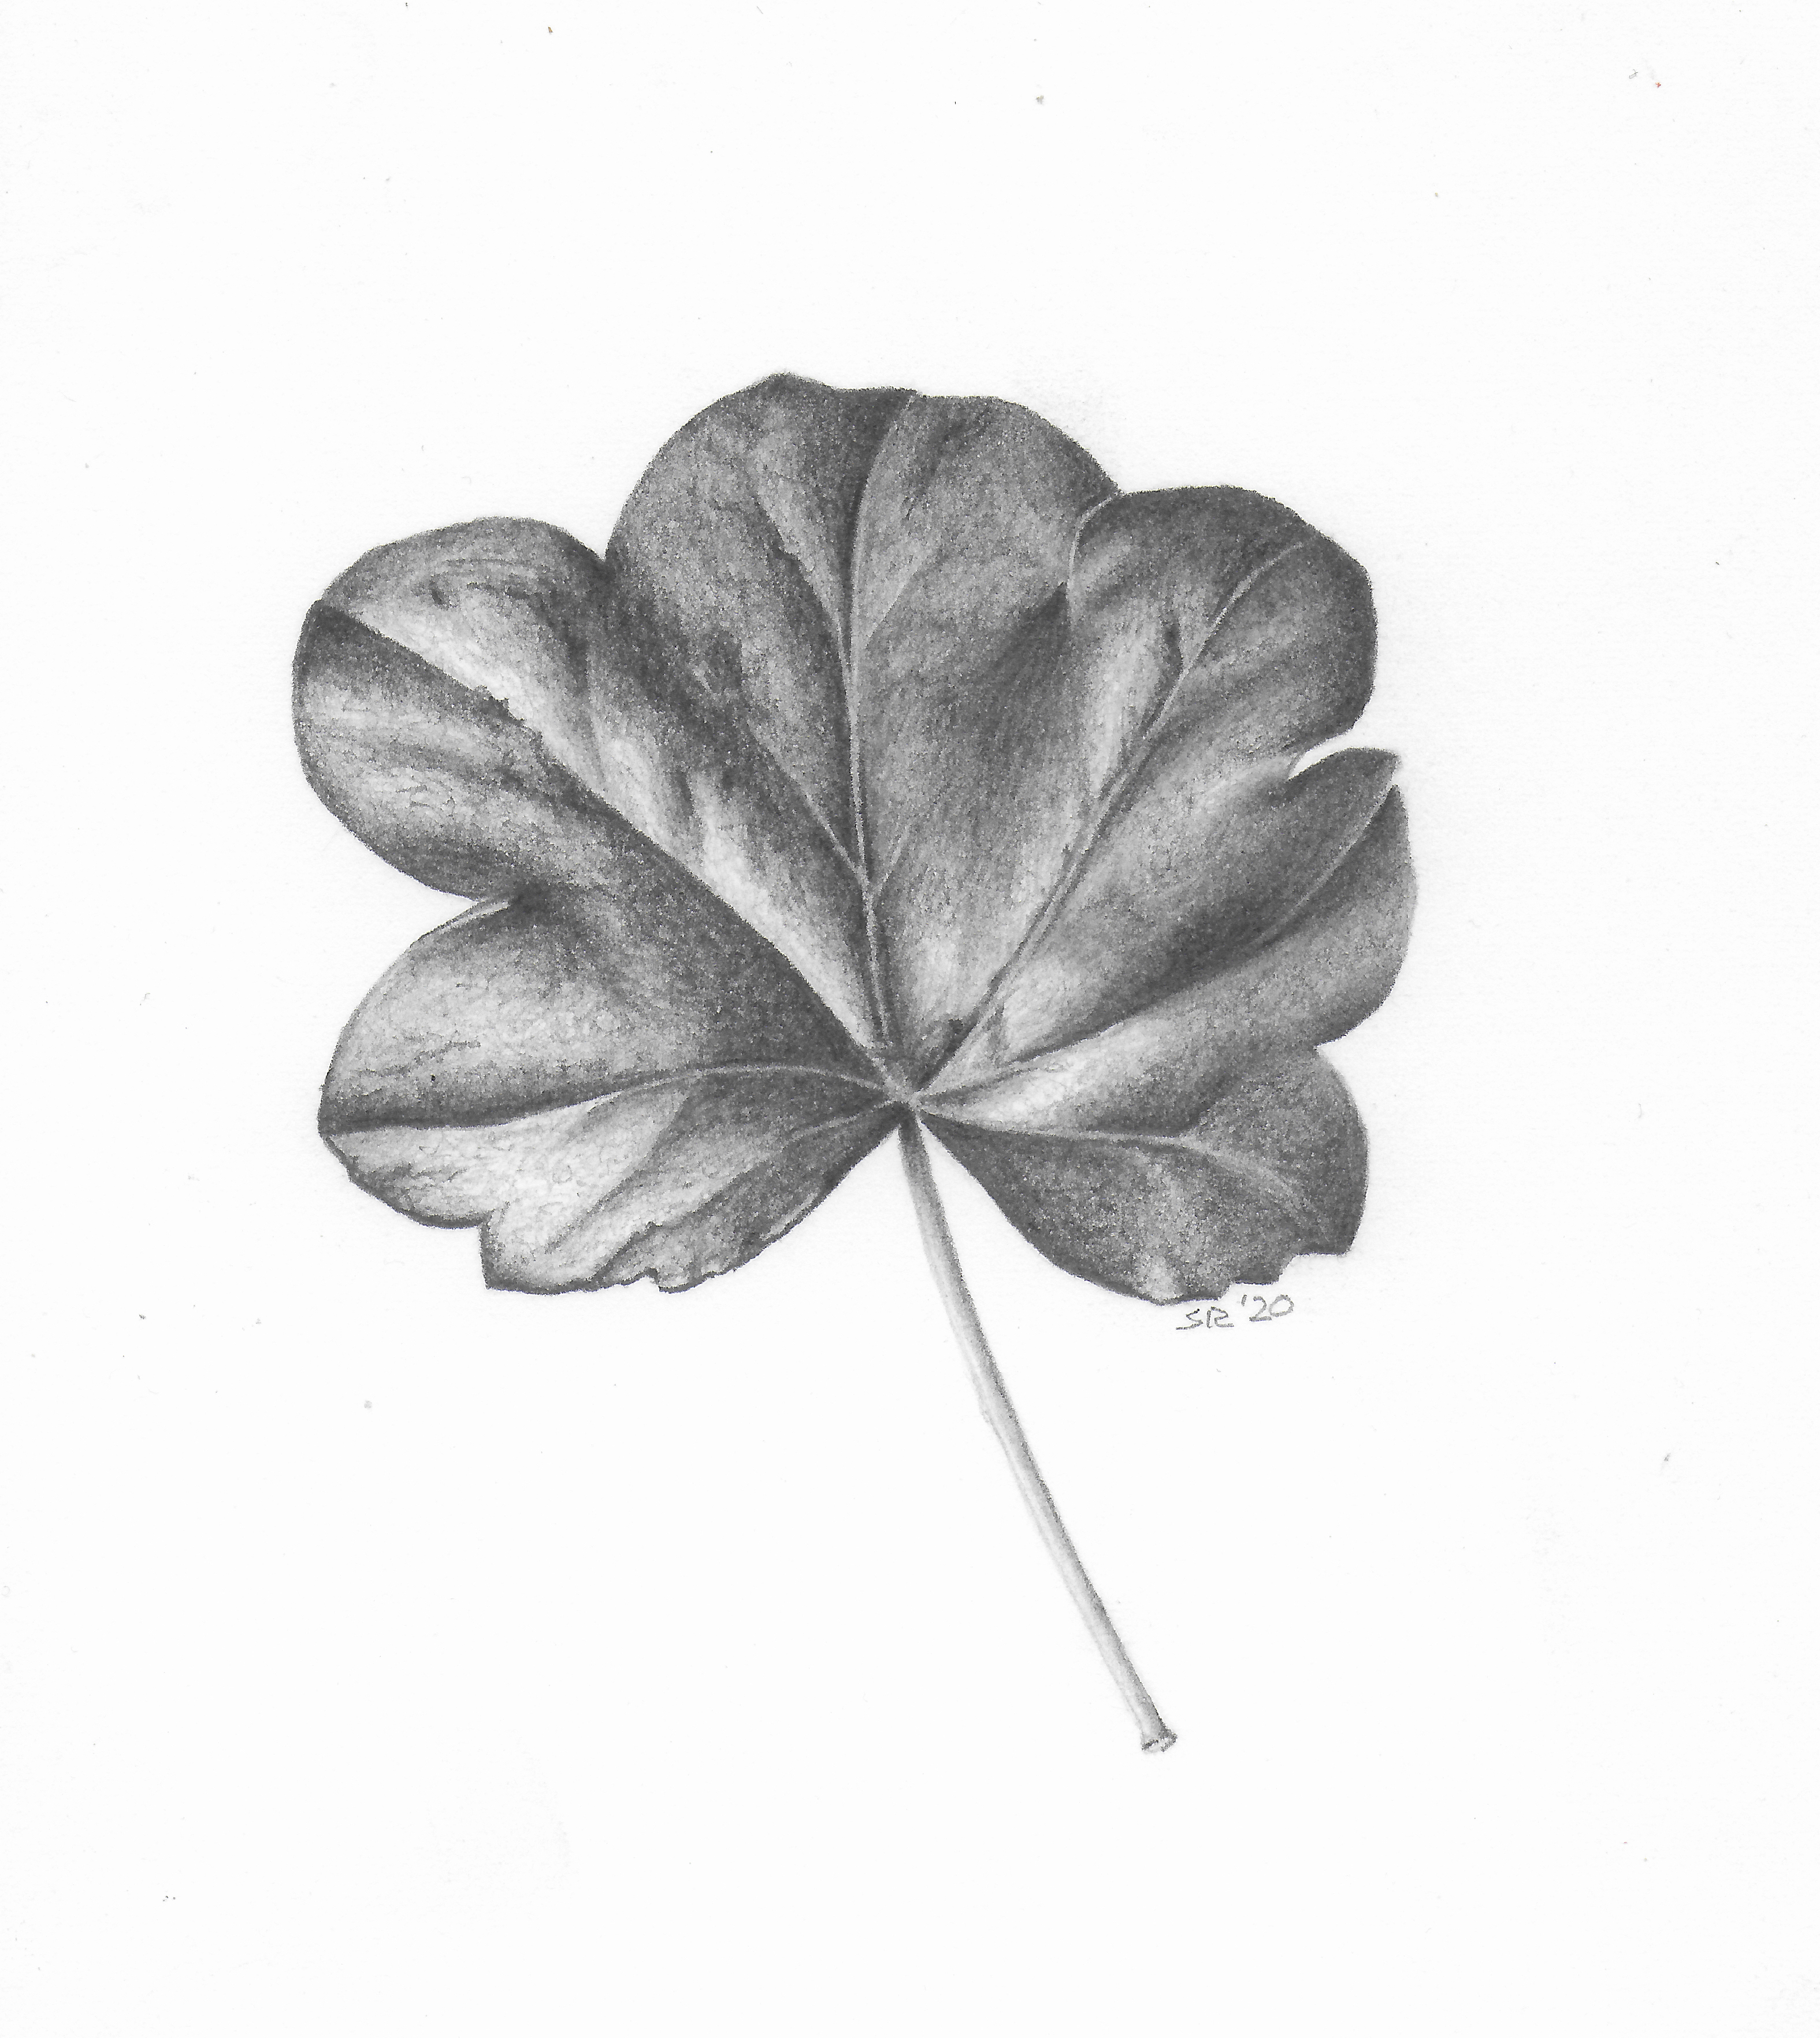 Leaf - Graphite